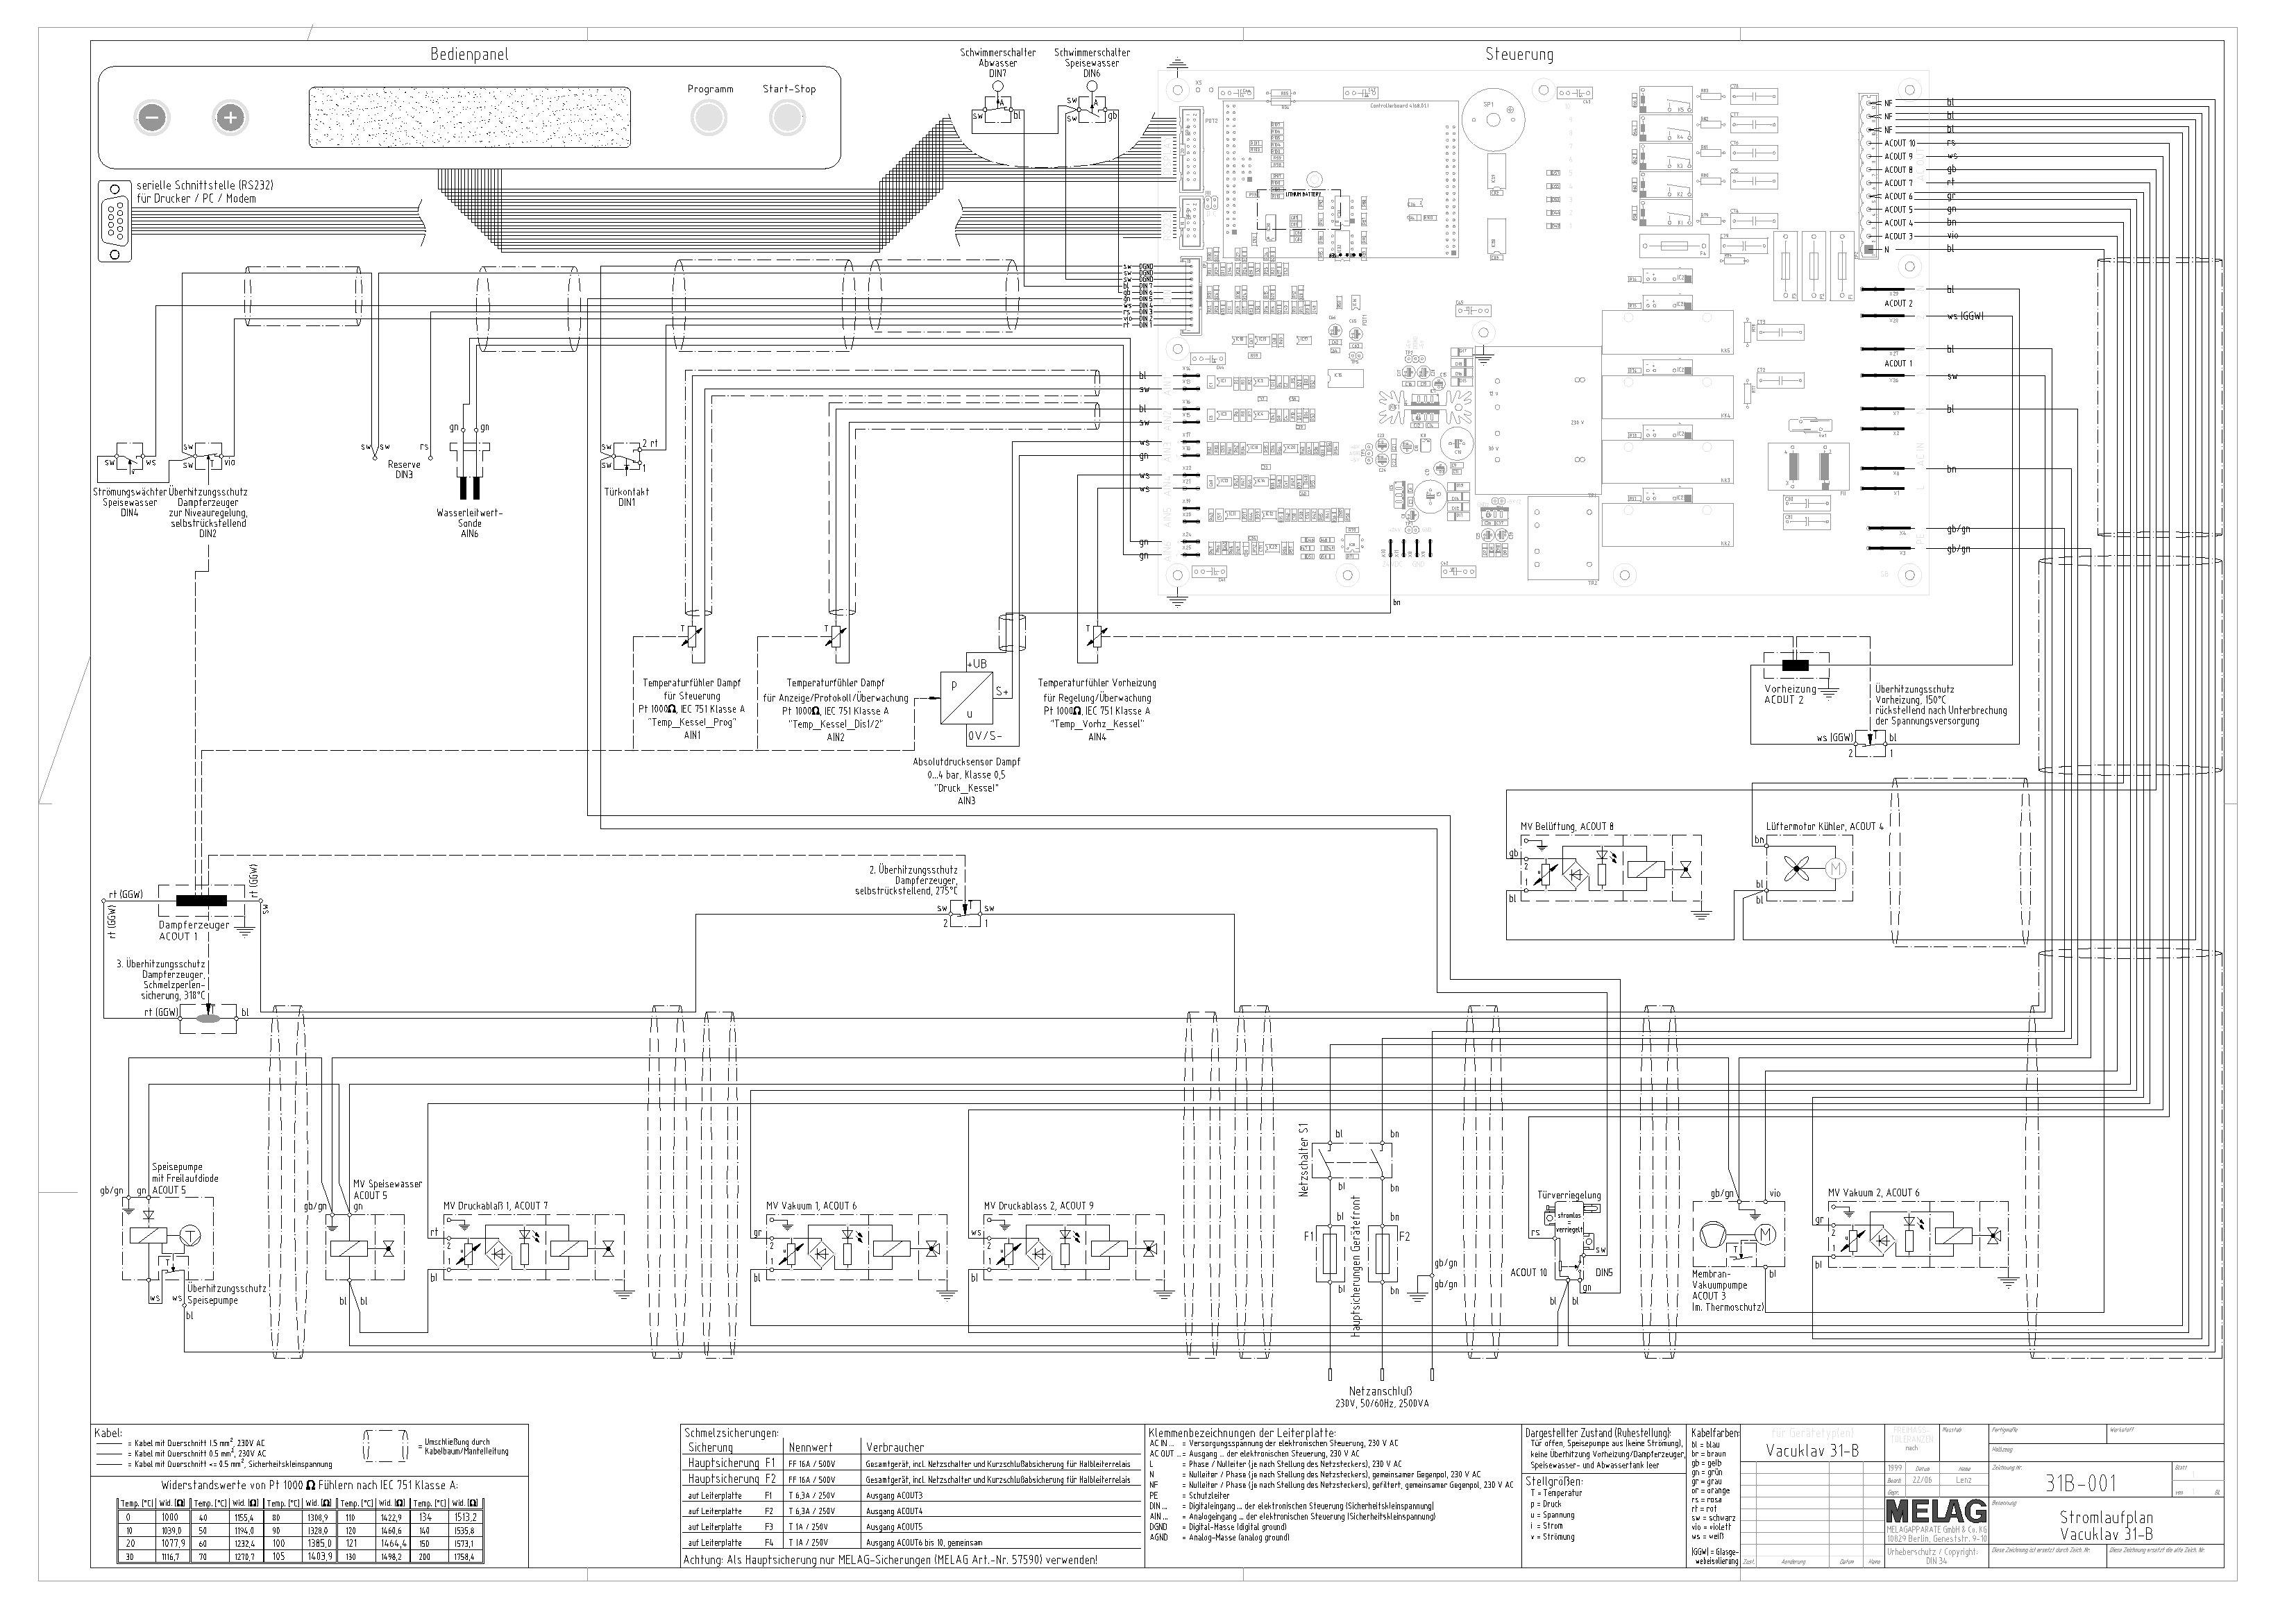 [SCHEMATICS_48DE]  GN_6498] Hospital Bed Remote Control Wiring Diagrams Wiring Diagram | Hospital Bed Remote Control Wiring Diagrams |  | Oidei Vell Aidew Illuminateatx Librar Wiring 101